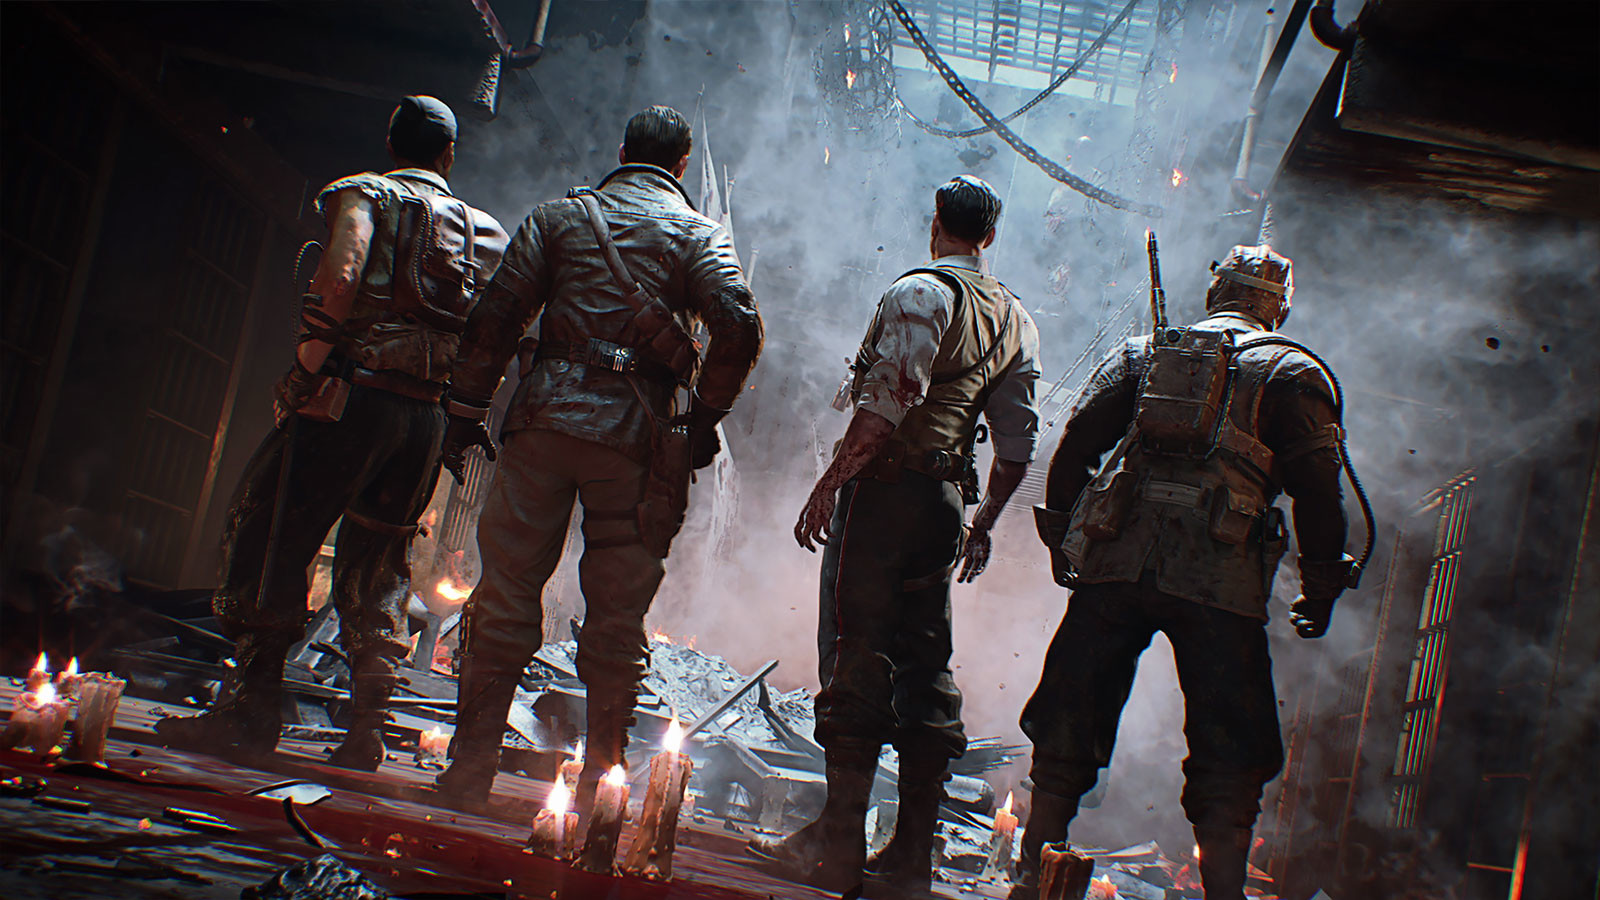 Call Of Duty Black Ops 4 Digital Deluxe Battle Net Key For Pc Buy Now